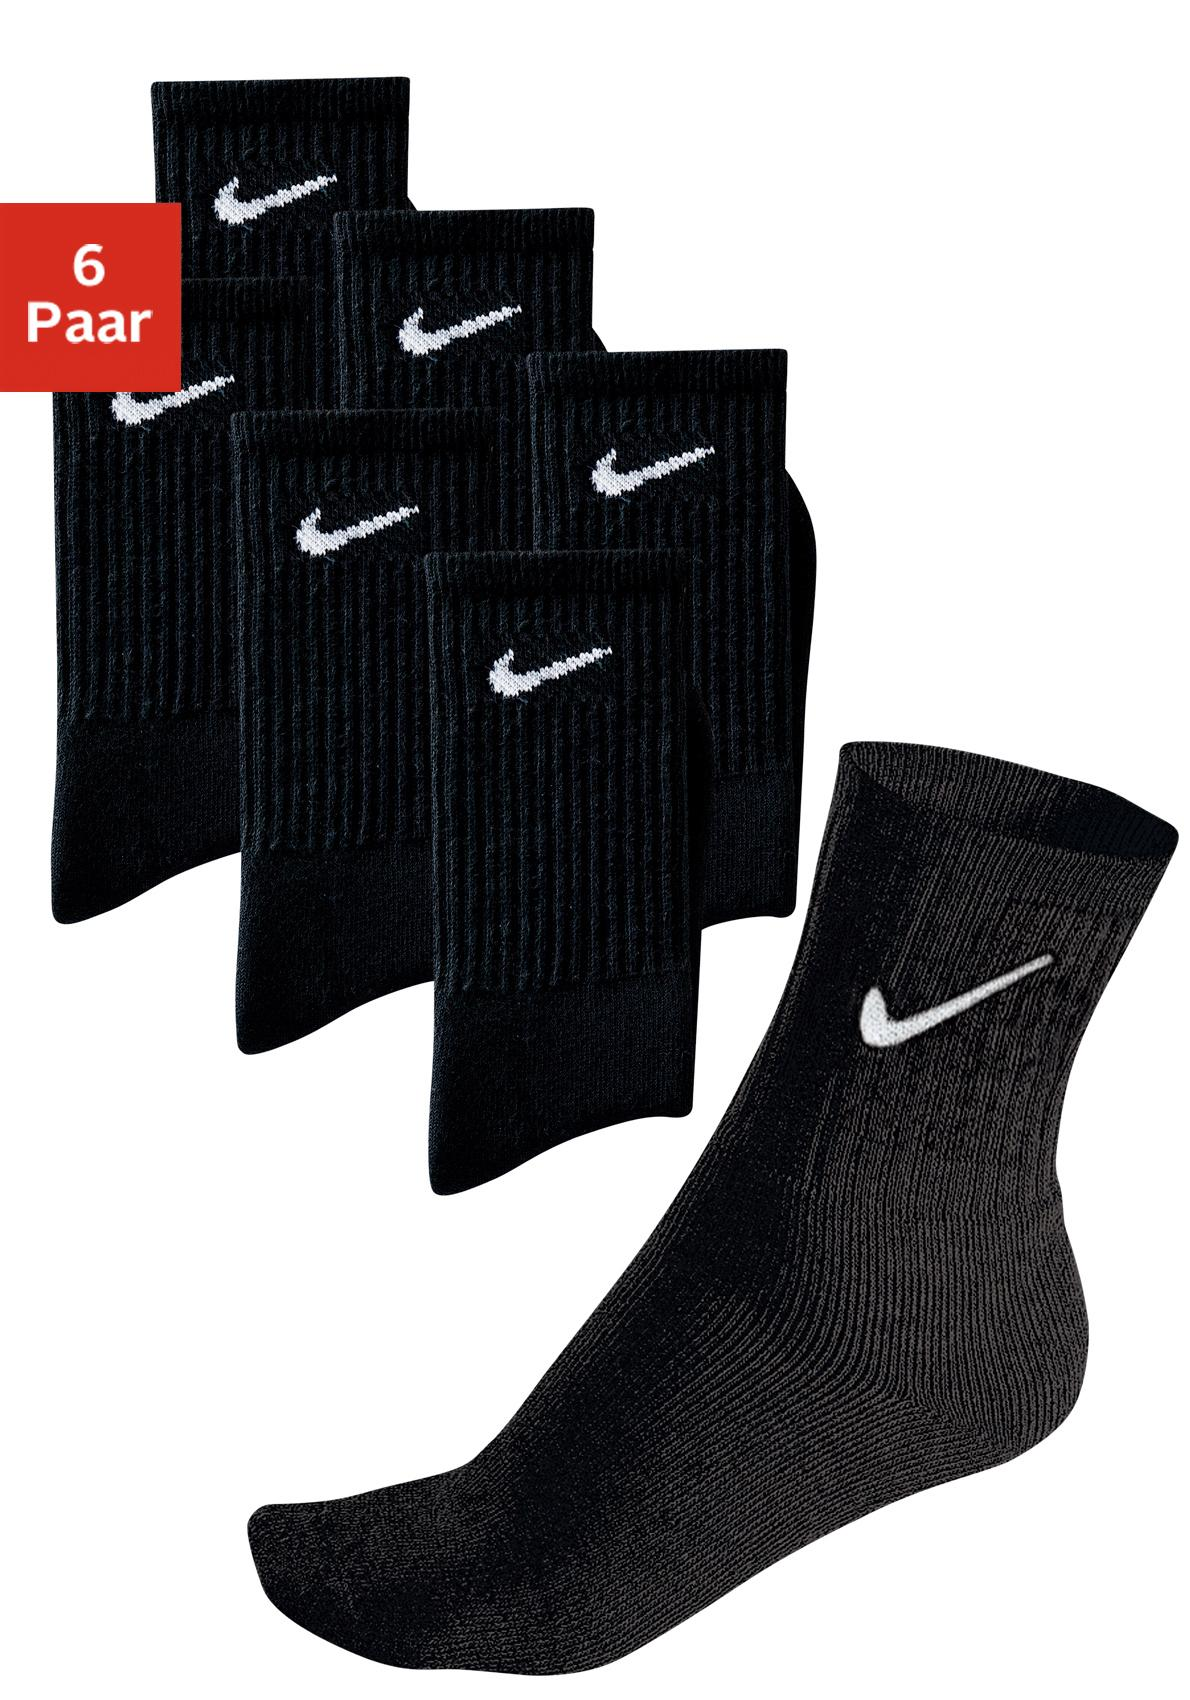 Nike Sportsocken (6 Paar) mit Fußfrottee